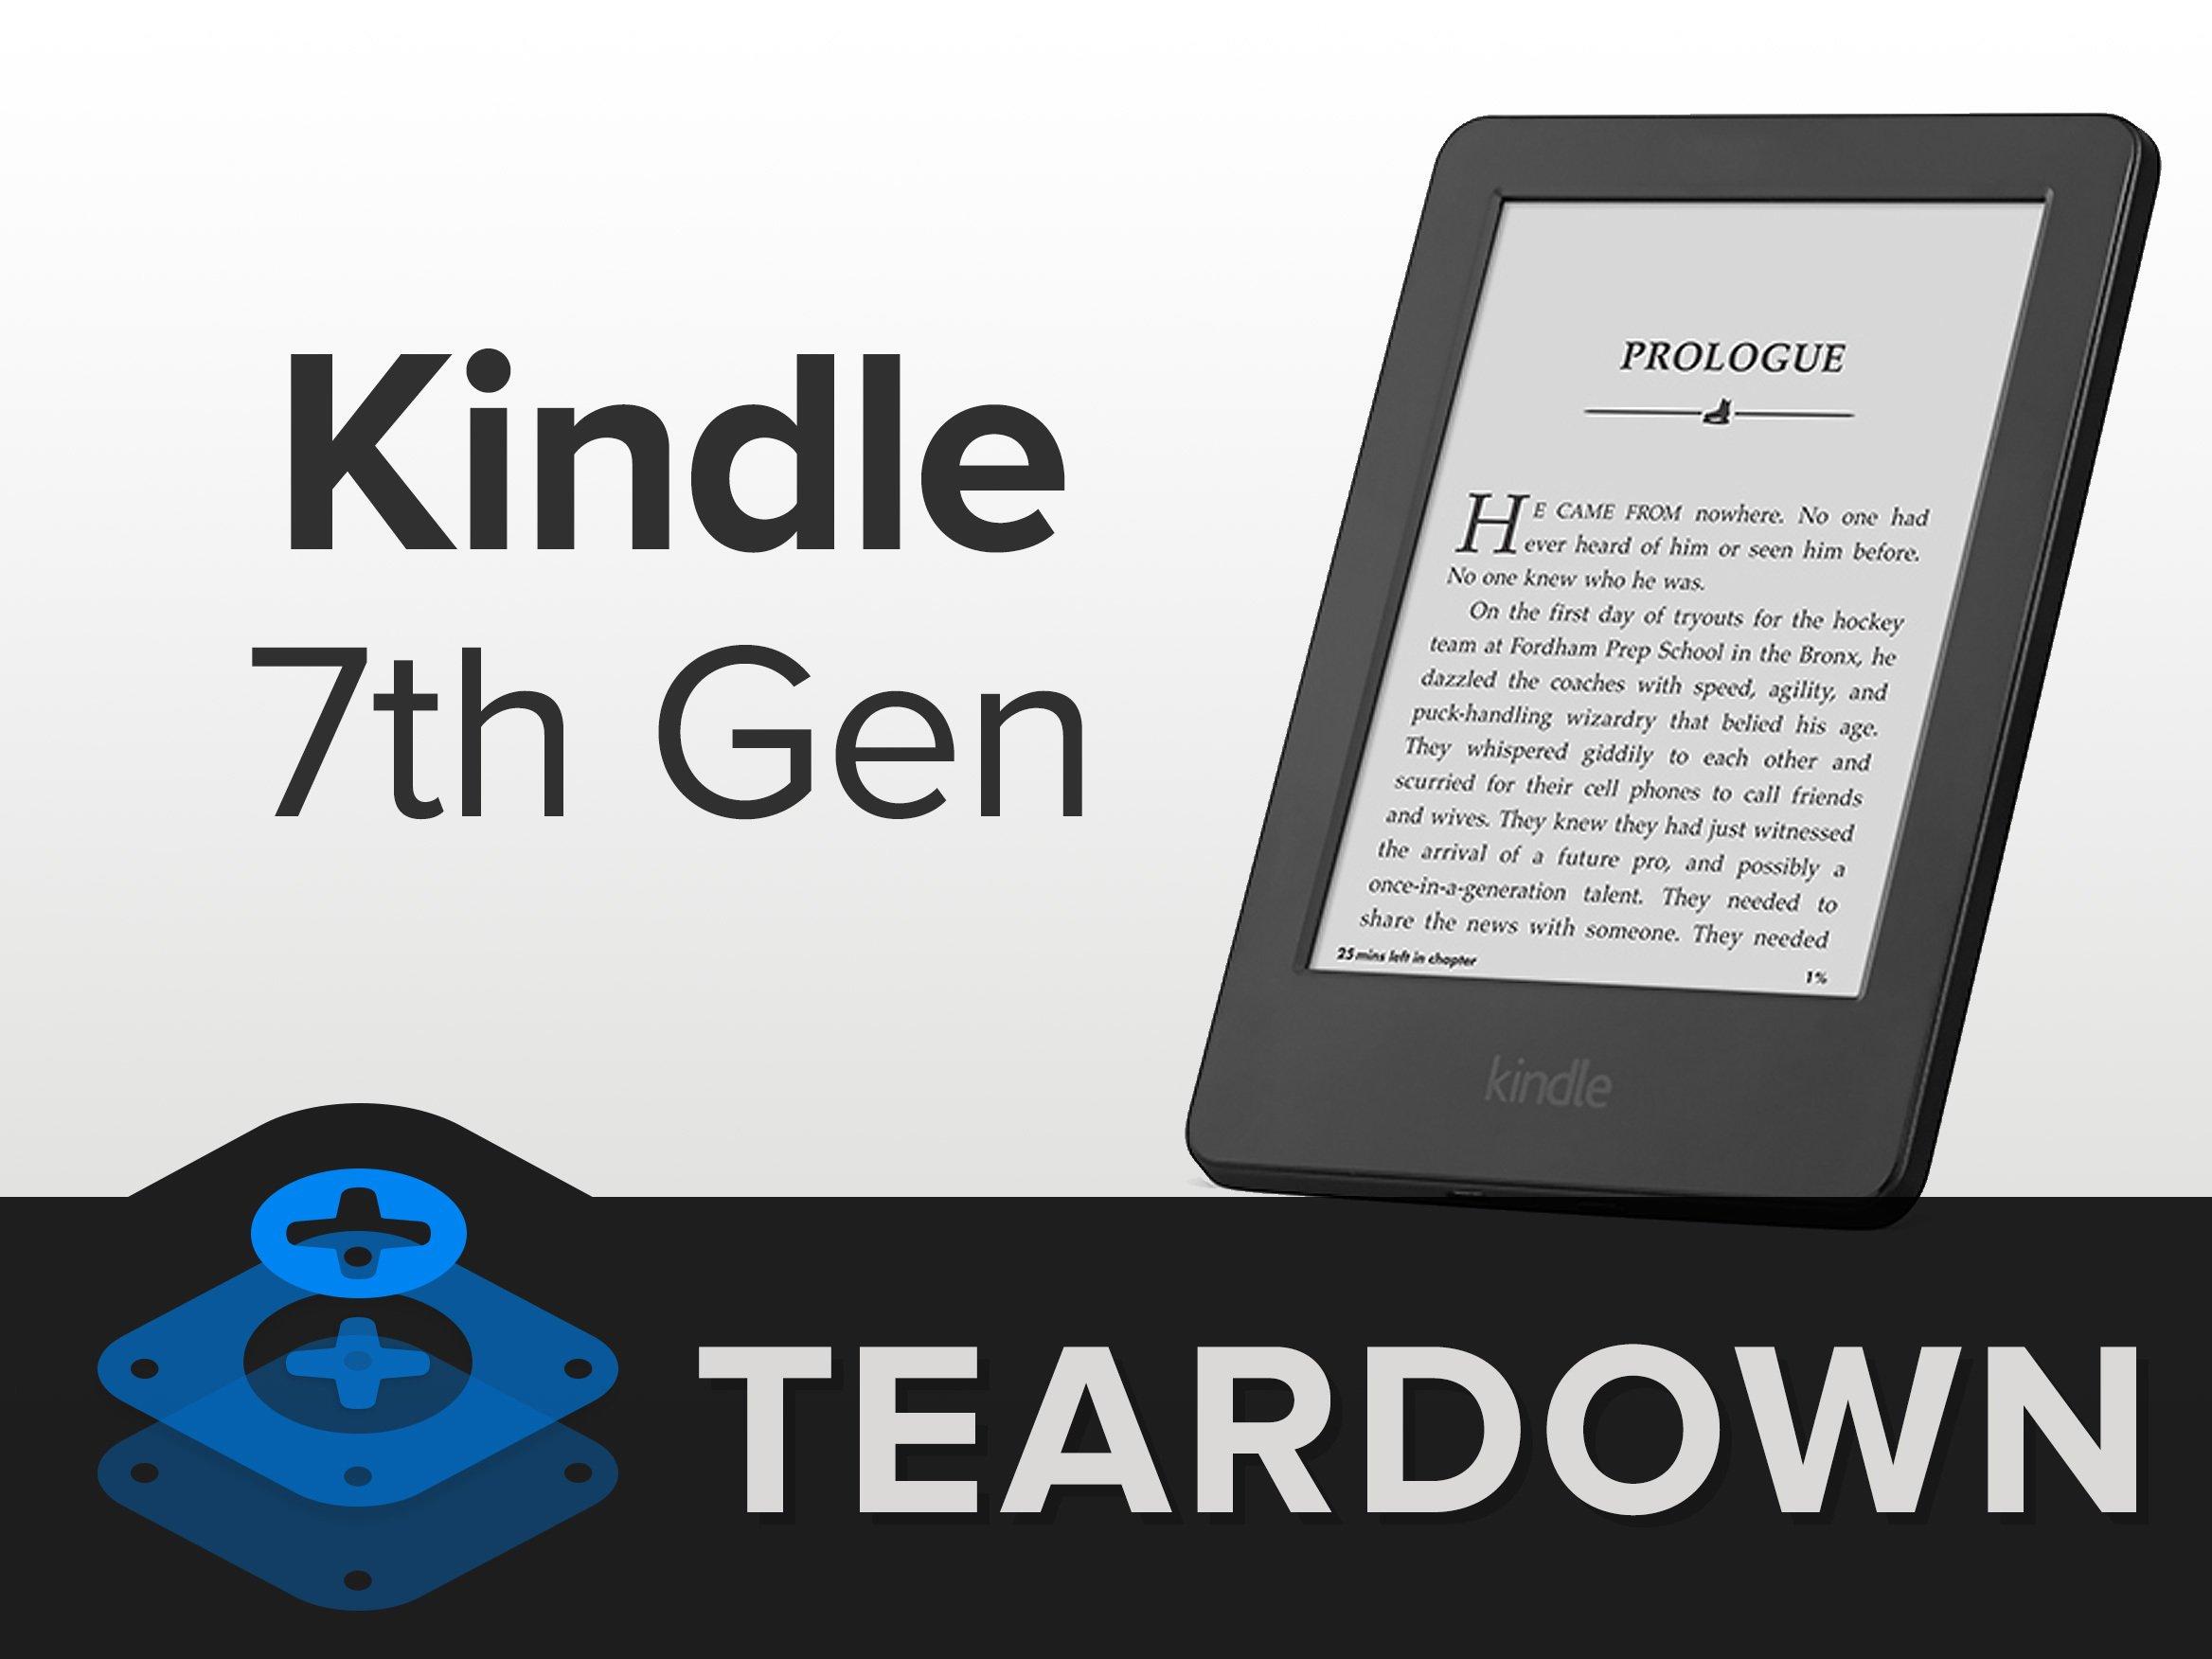 Kindle 7th Generation Teardown - iFixit